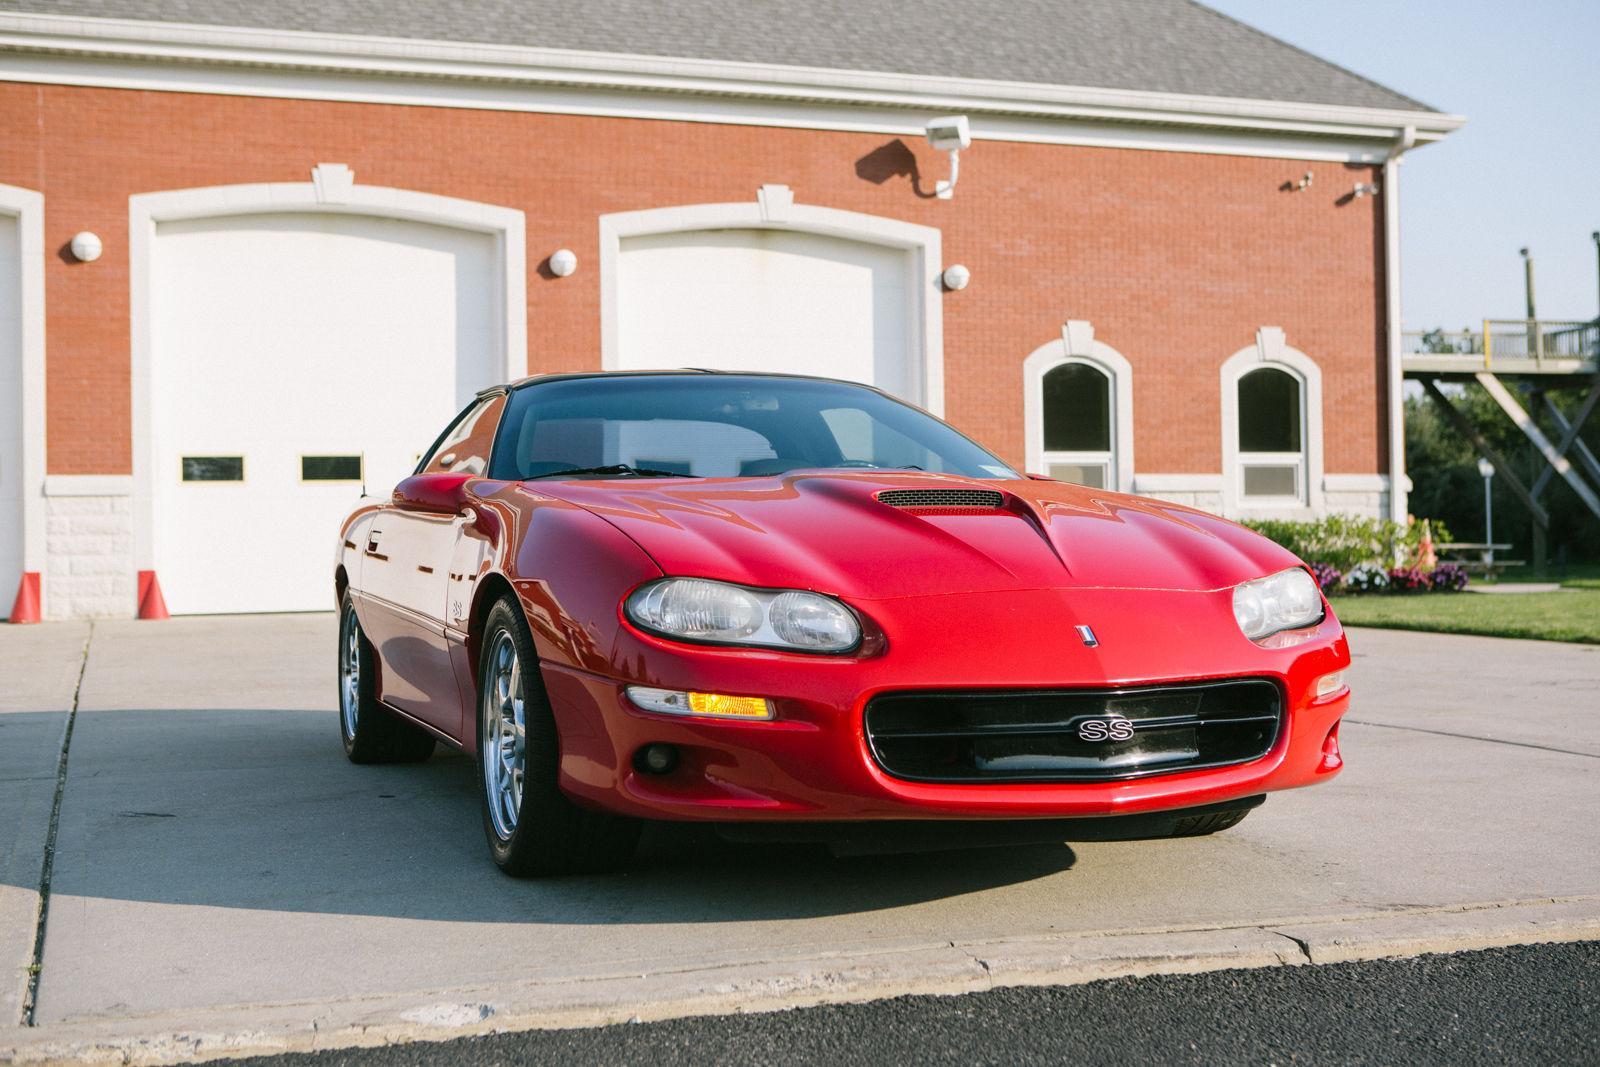 2000 Chevrolet Camaro Ss Factory Slp Car For Sale